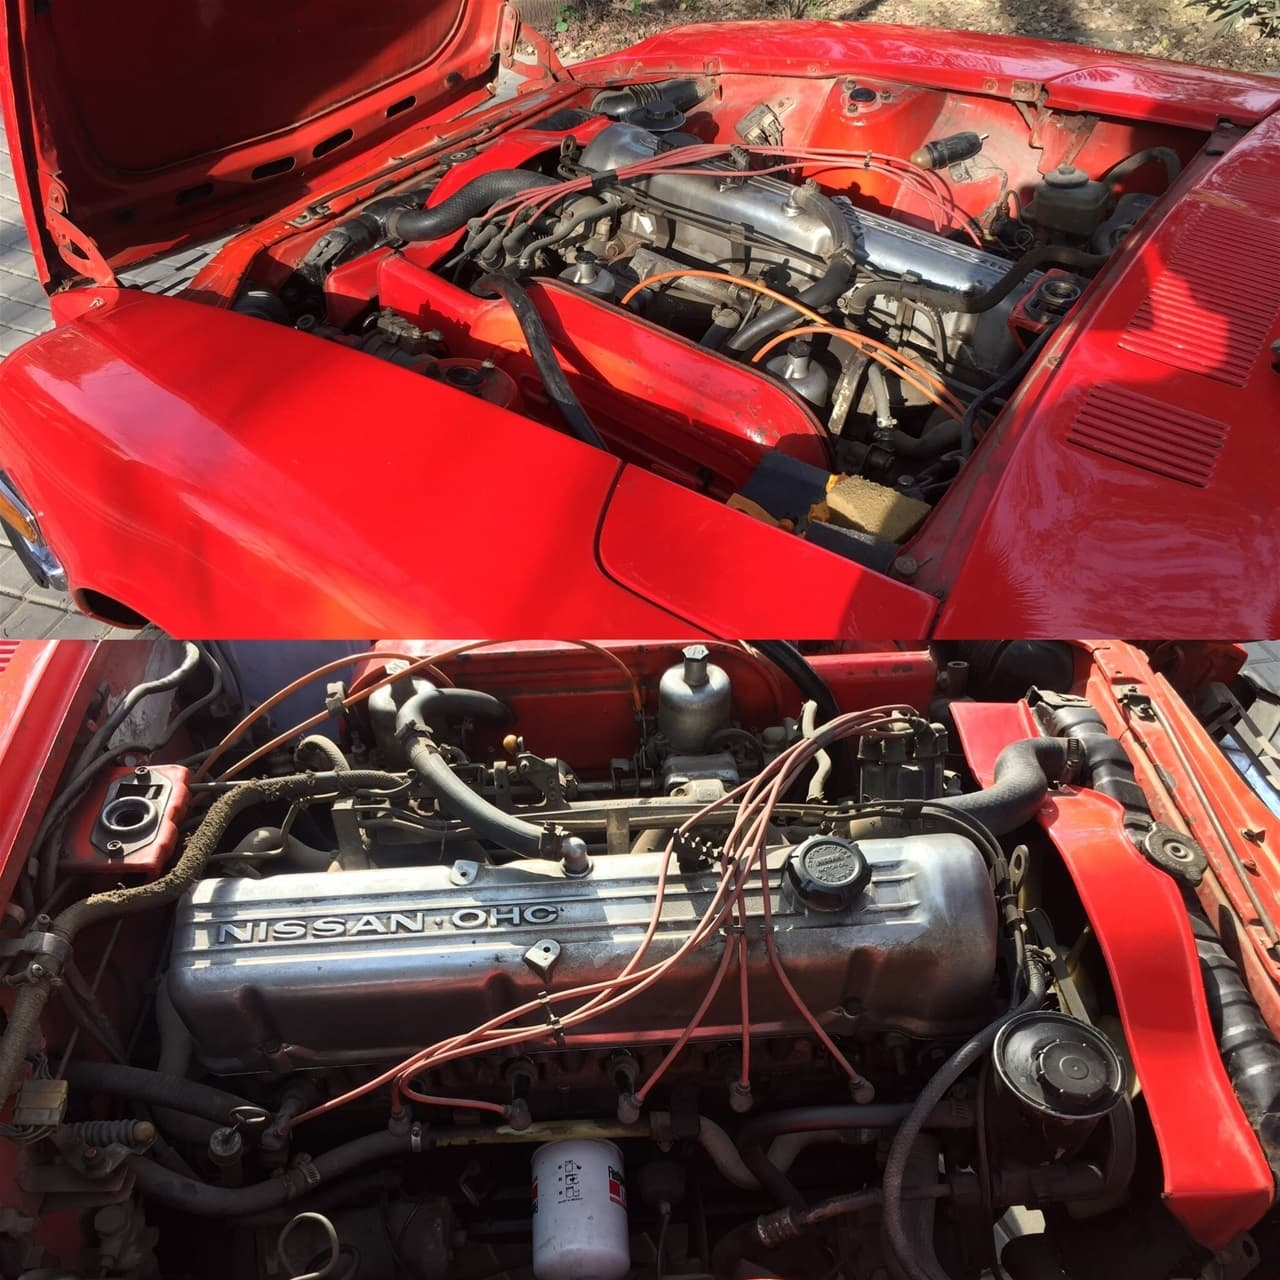 Datsun's engine.